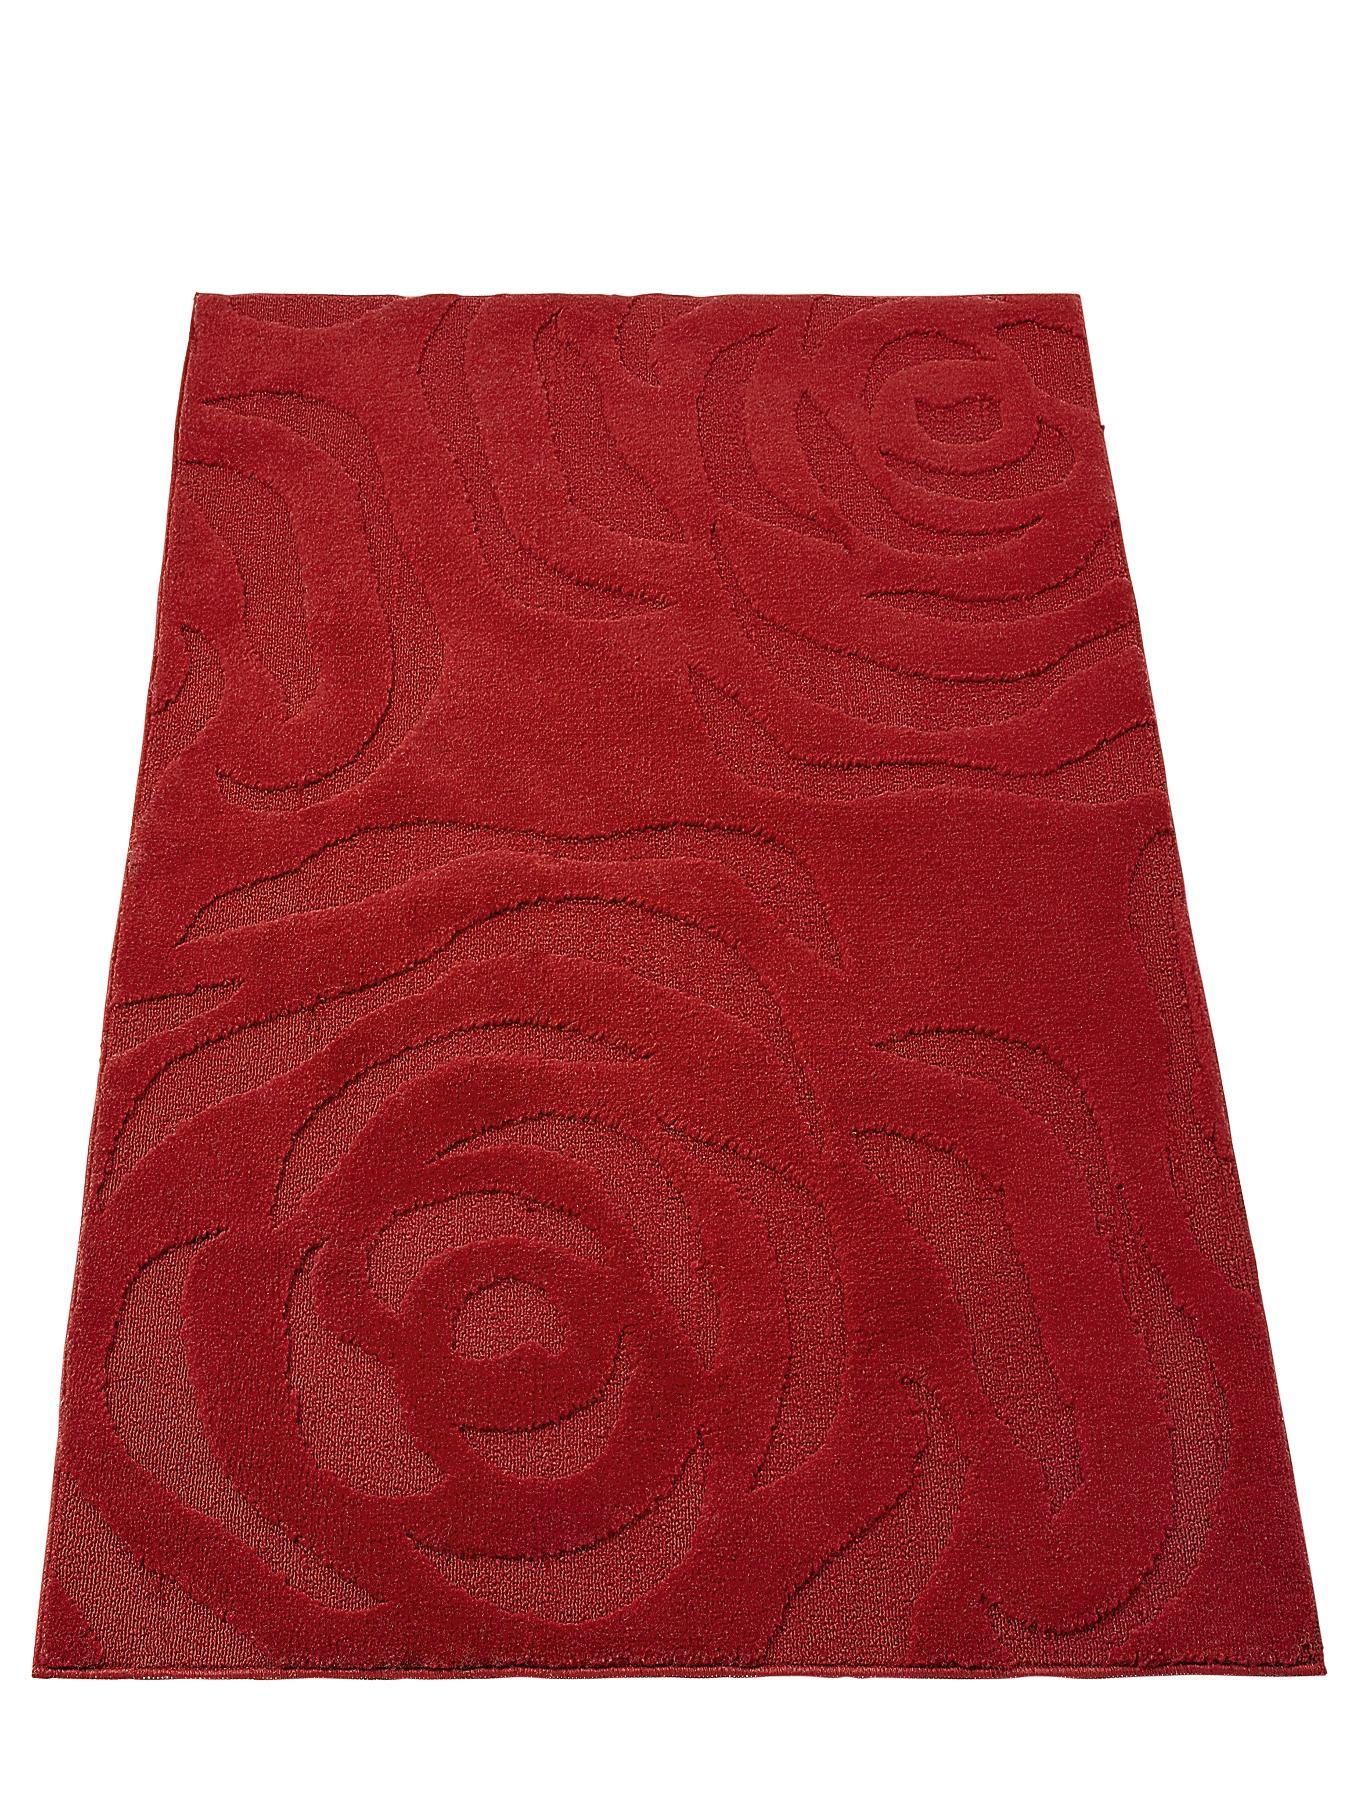 Rose Washable Rug RedChocolate